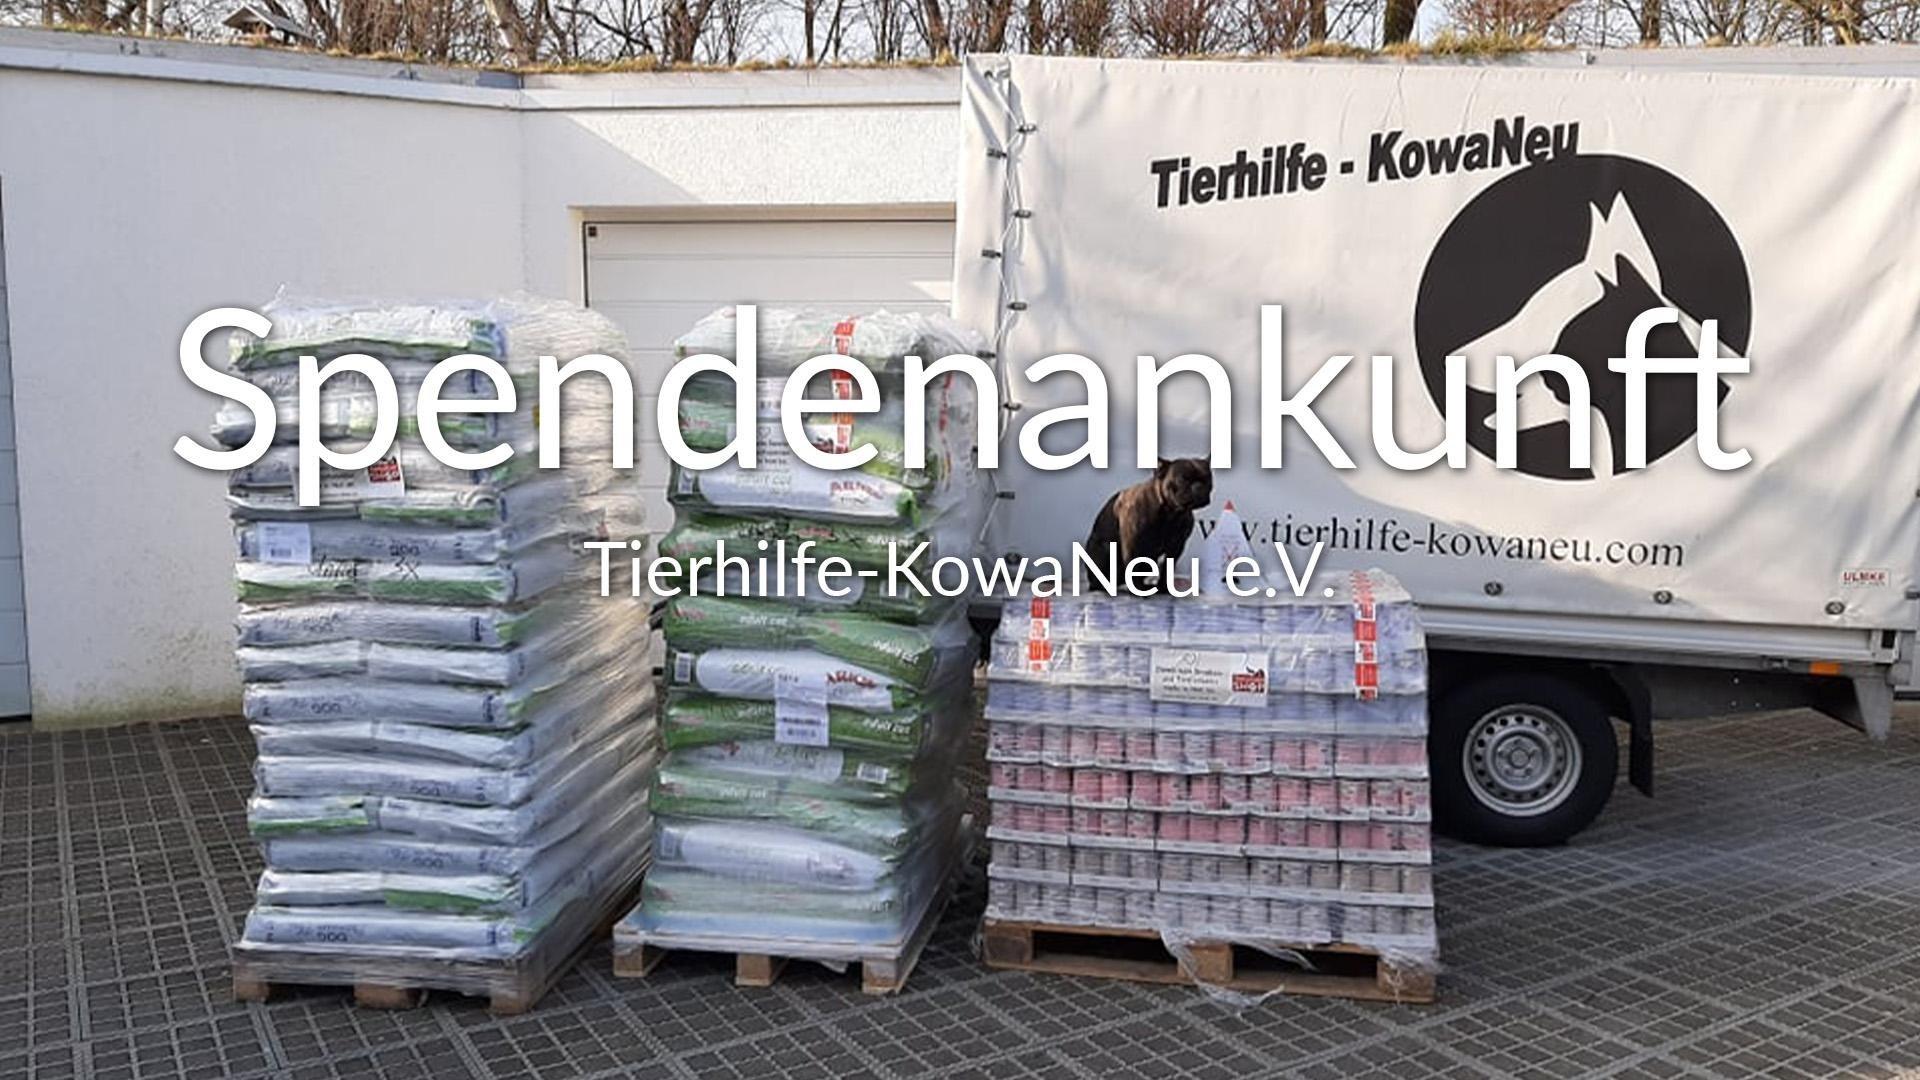 Tierhilfe-KowaNeu_eV_Videos